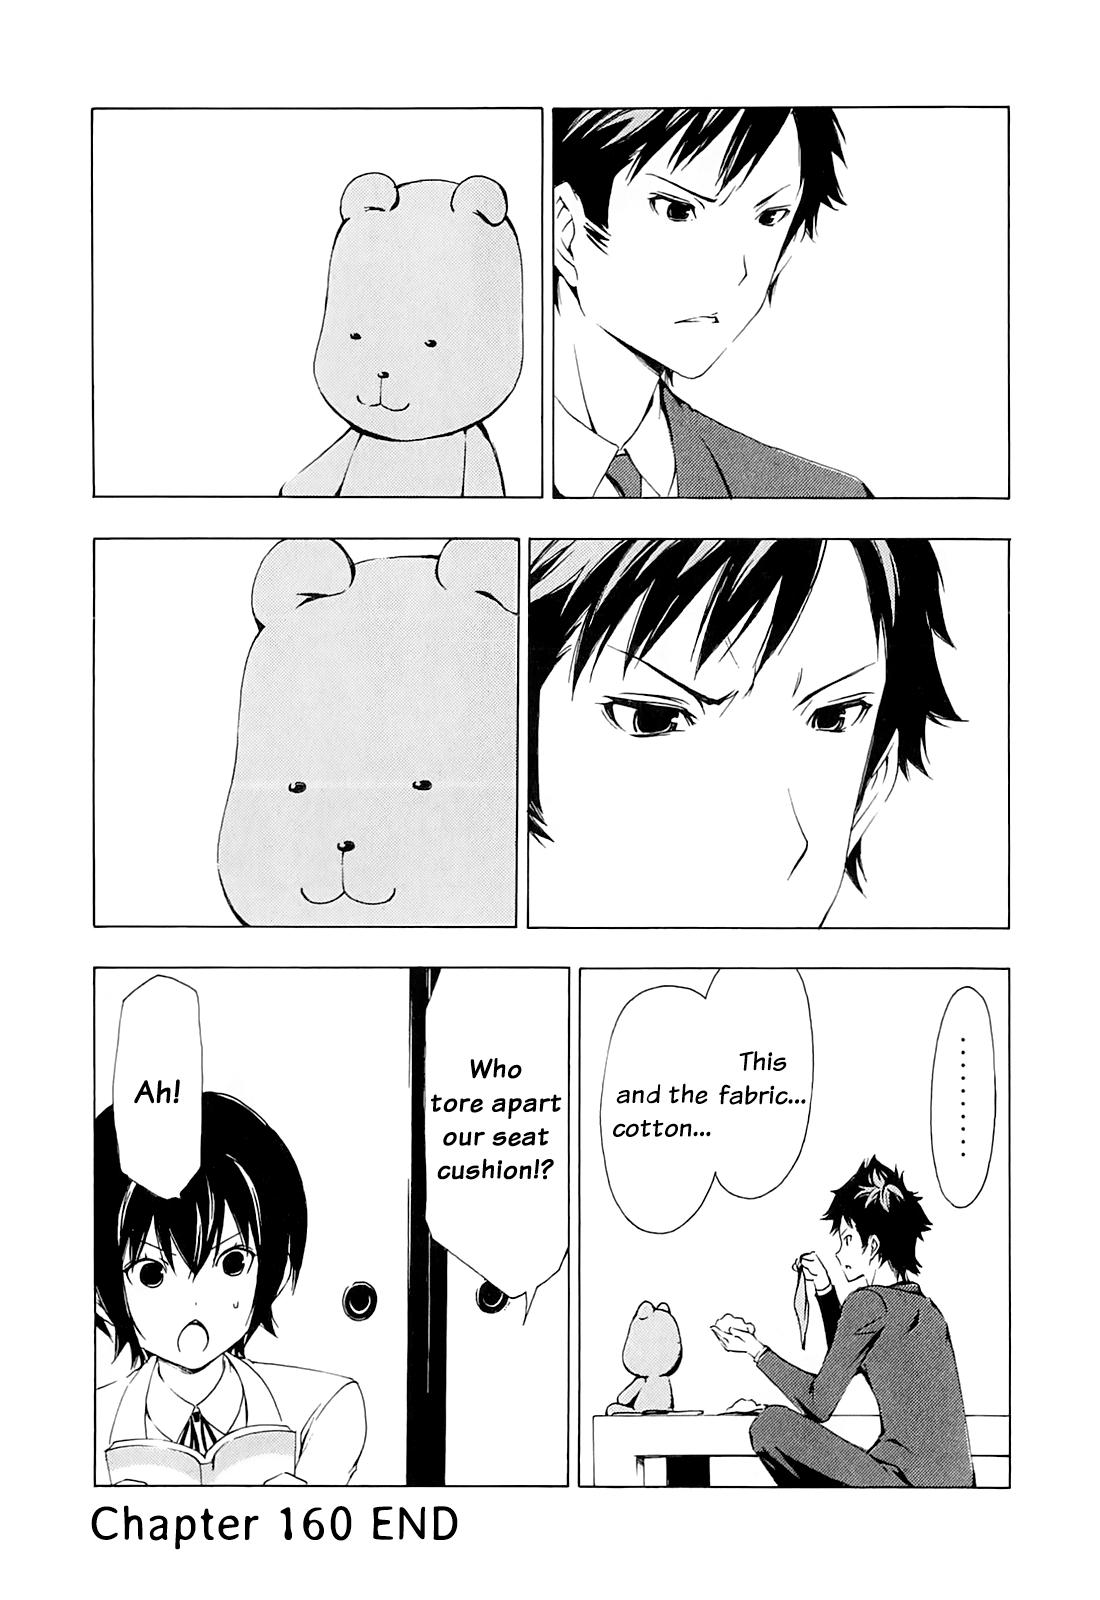 Minami-ke - Chapter 161